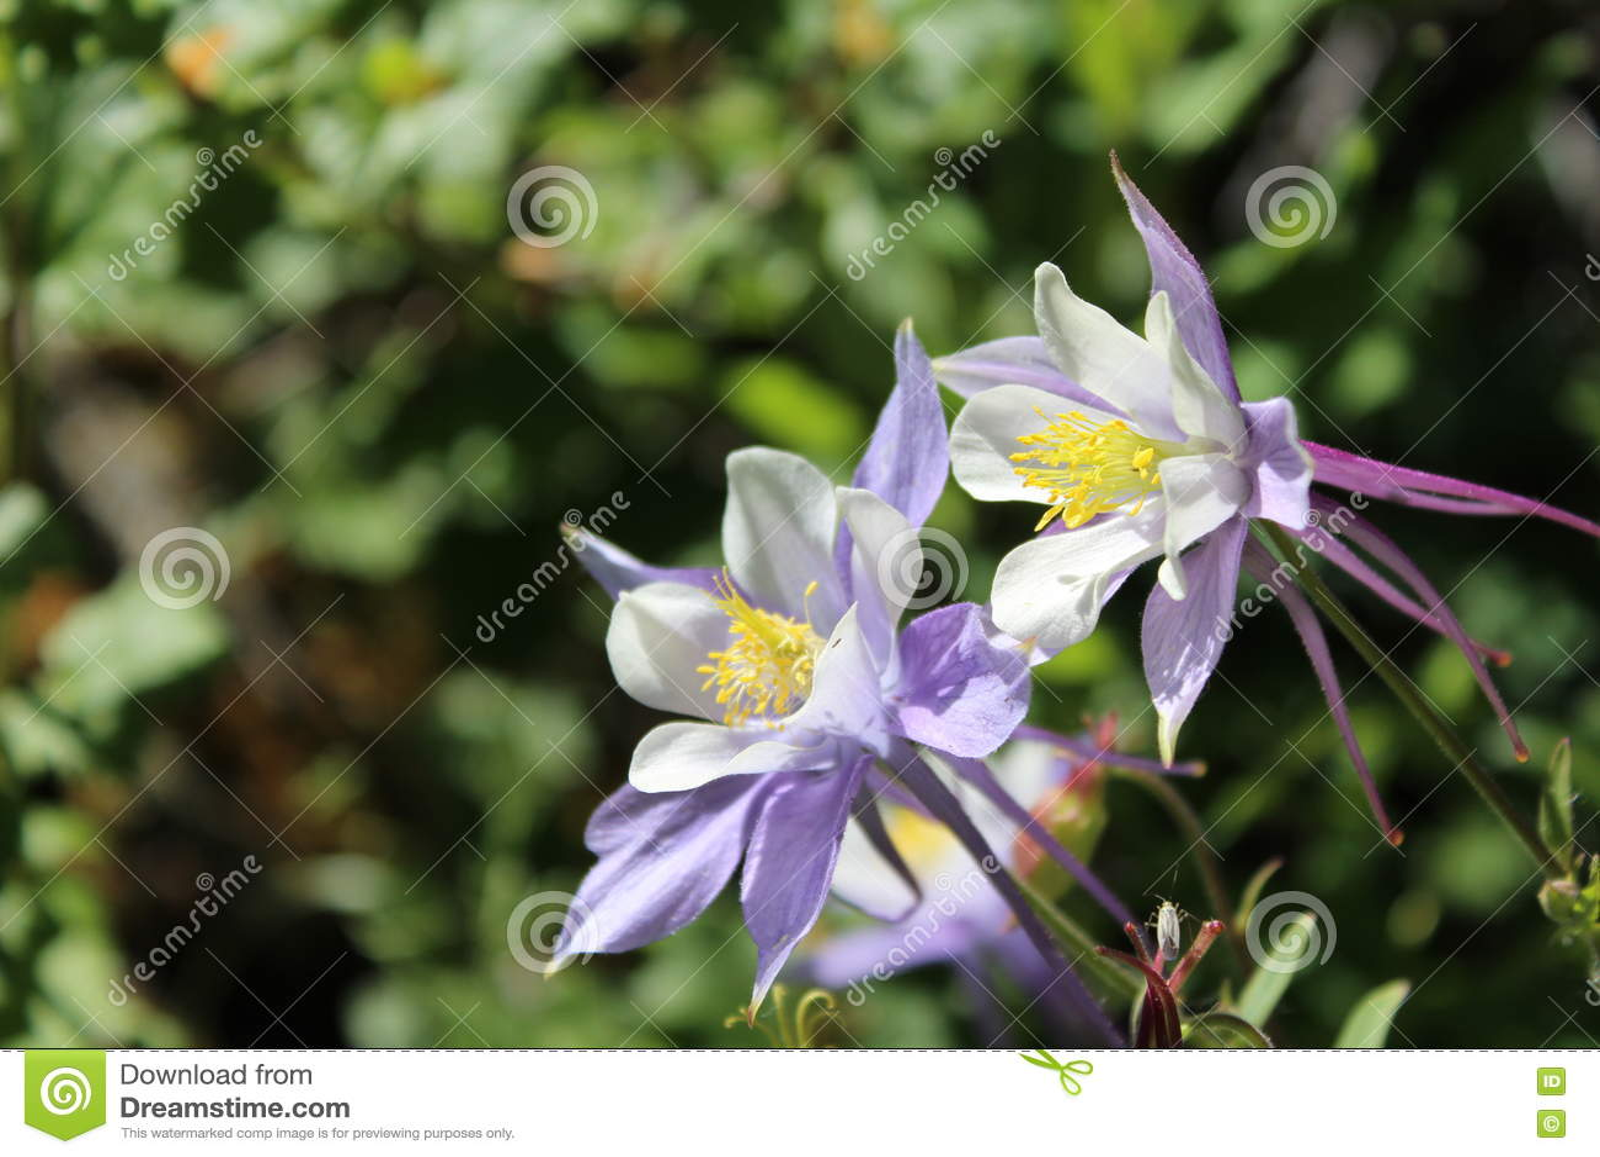 White purple wild columbine flowers stock photo image 79603307 aspen beautiful colorado columbine flowers mountains purple dhlflorist Gallery